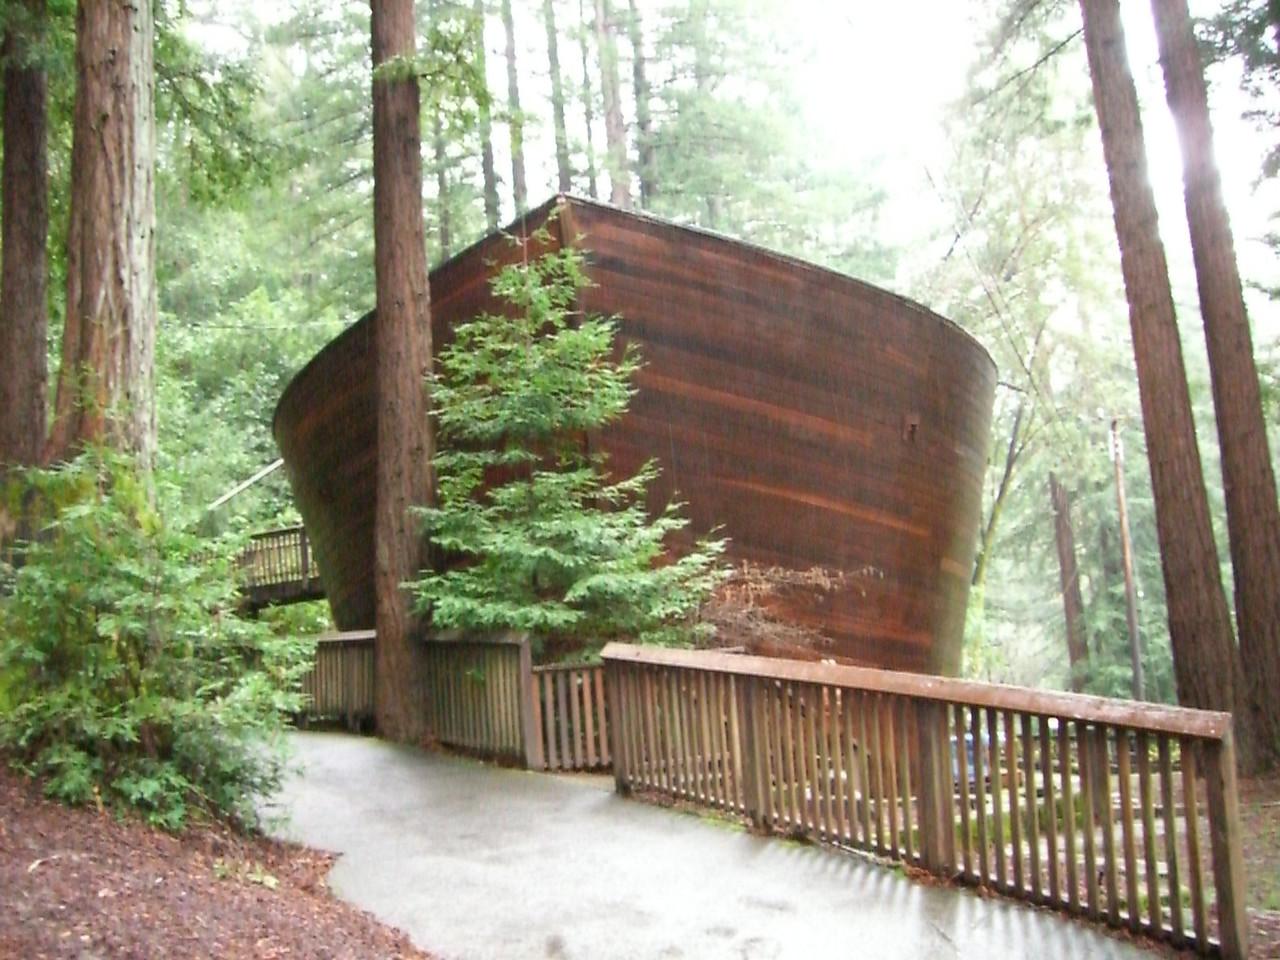 2006 02 19 Sun - WCC - The Ark @ Redwood Christian Park - front